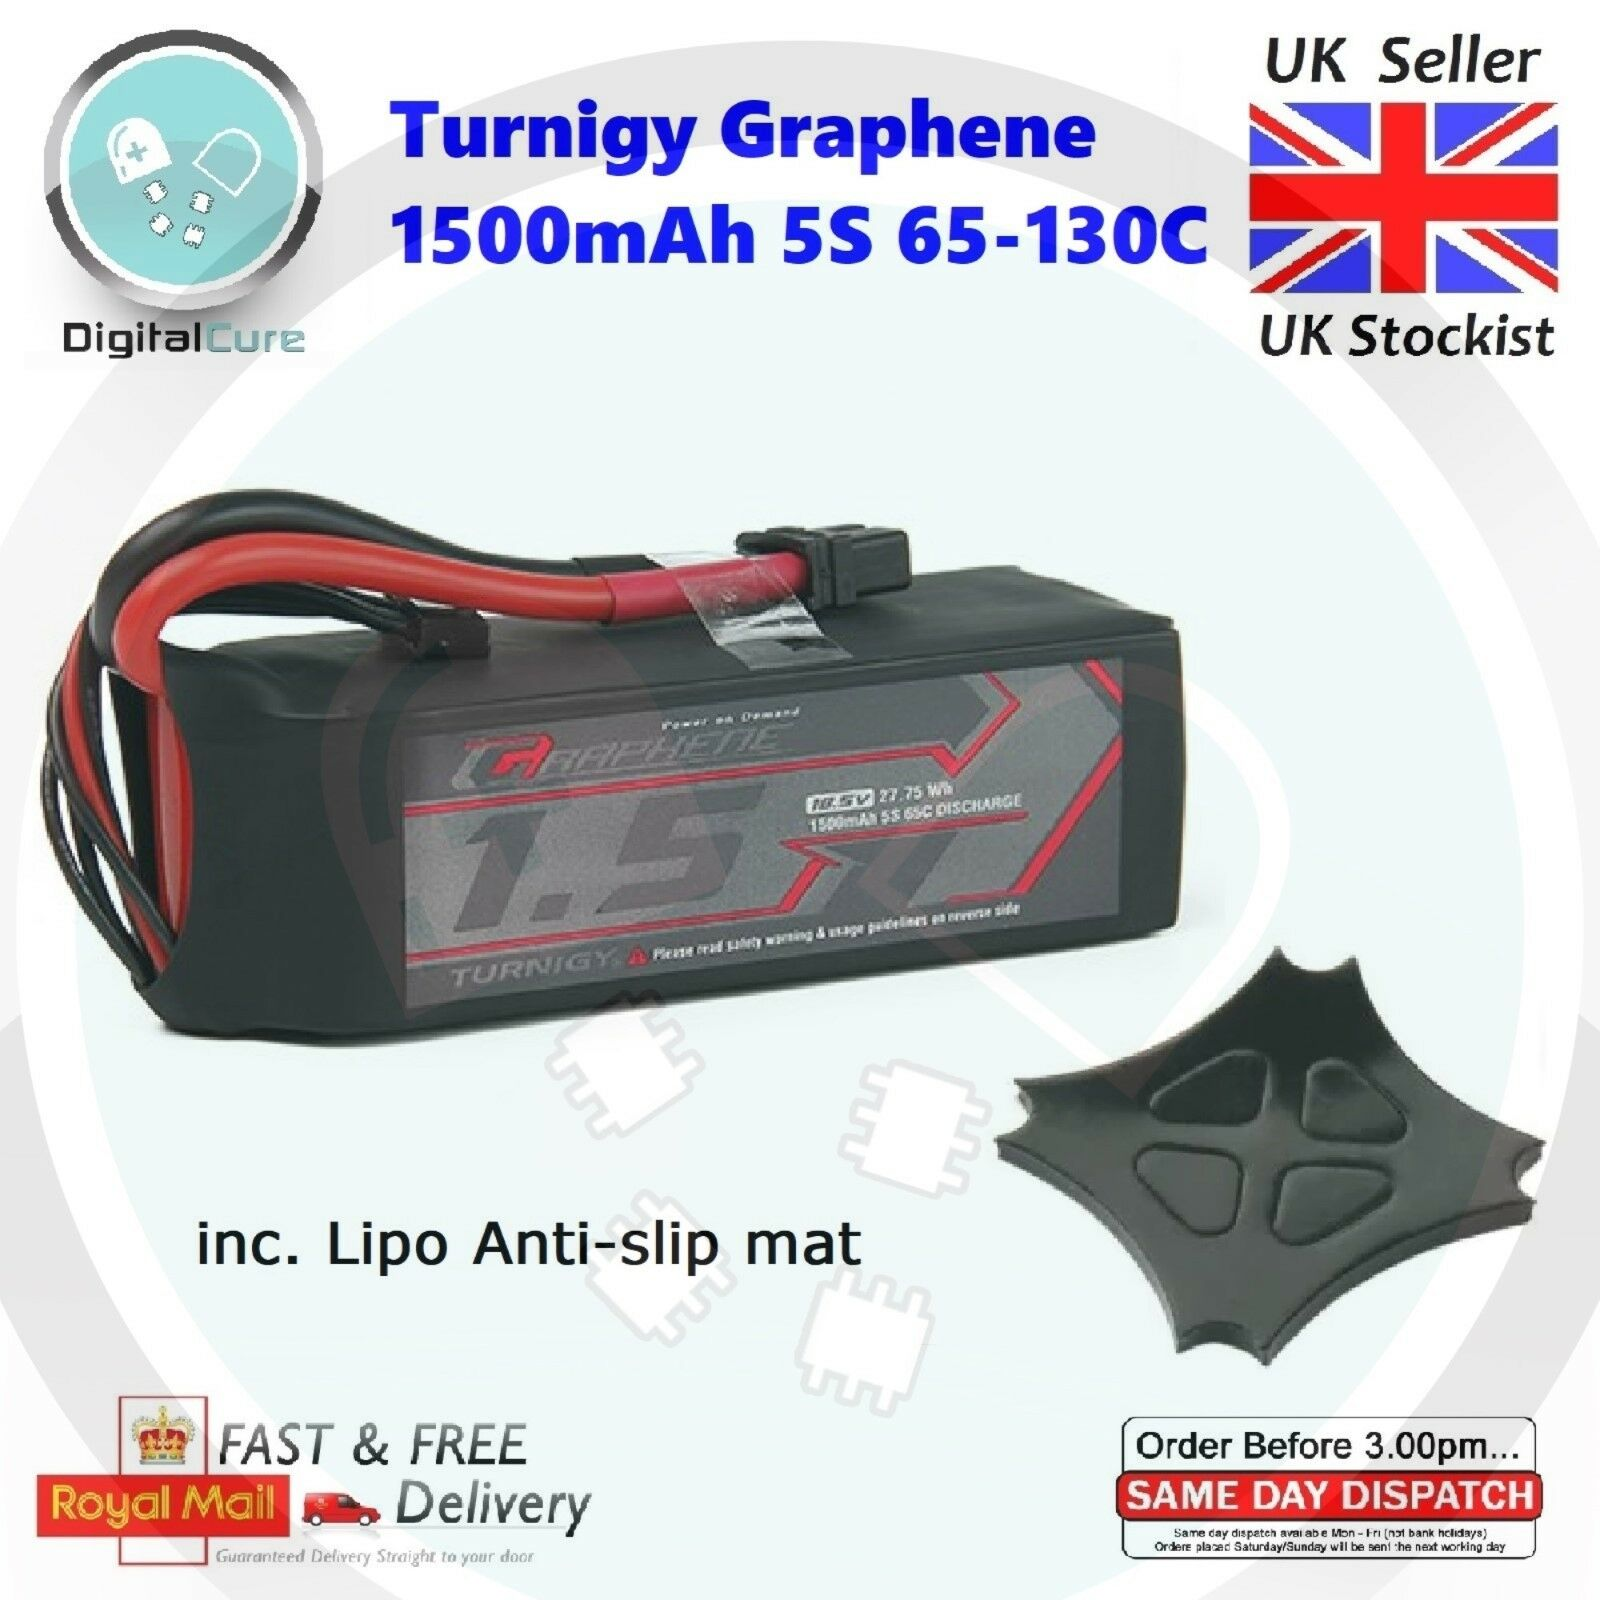 Turnigy Graphene 1500mAh 18.5V 5S 65C-130C LiPo Battery XT60- 1800 1300 4S 6S